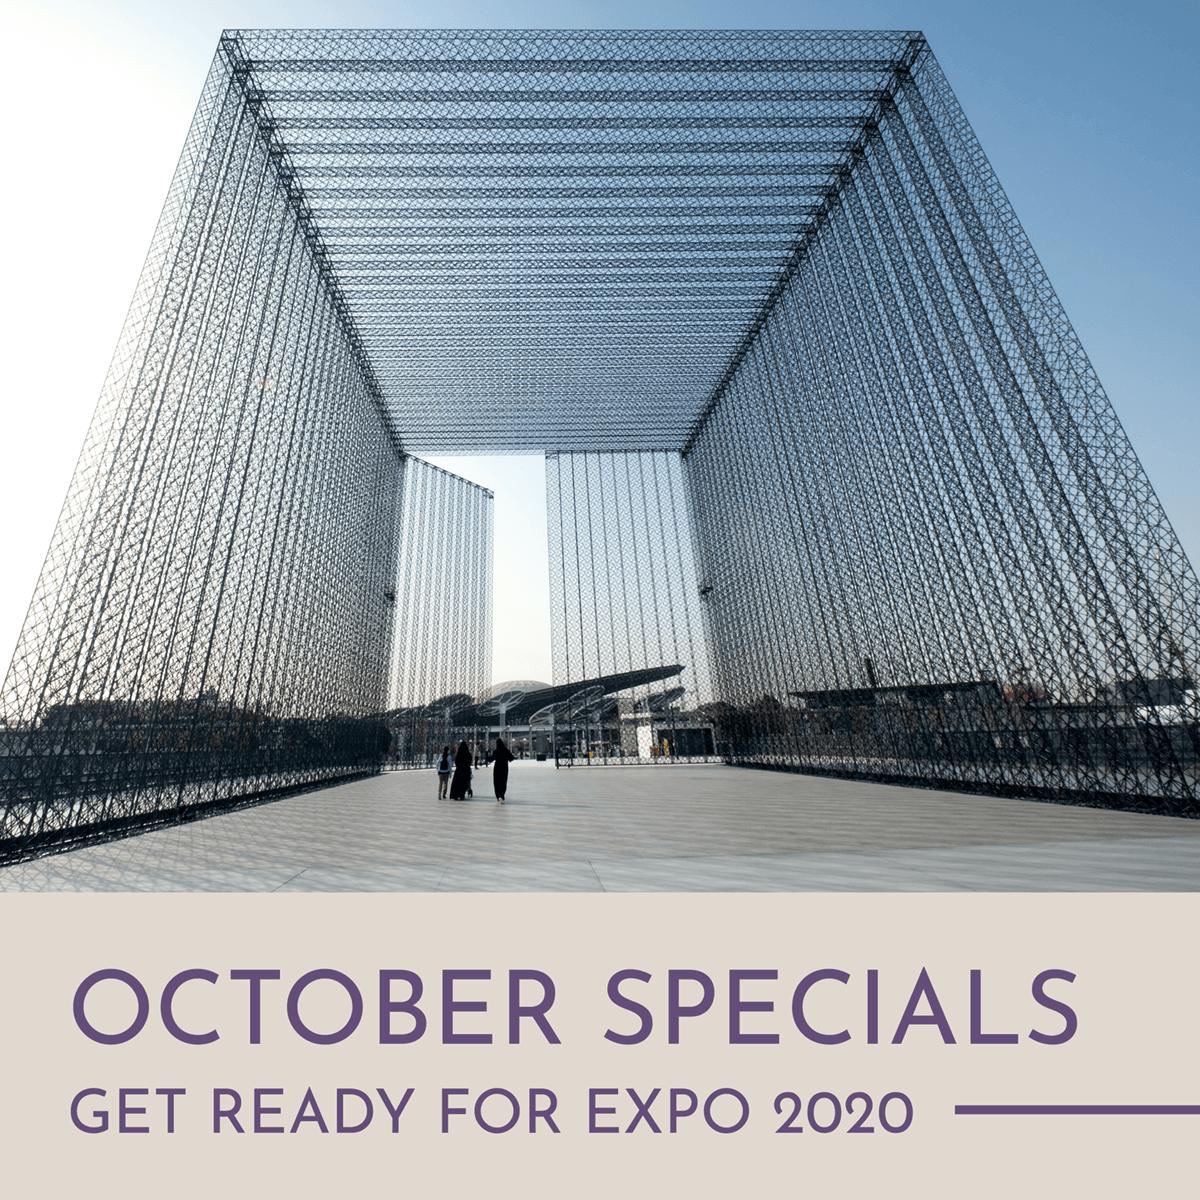 See October Specials